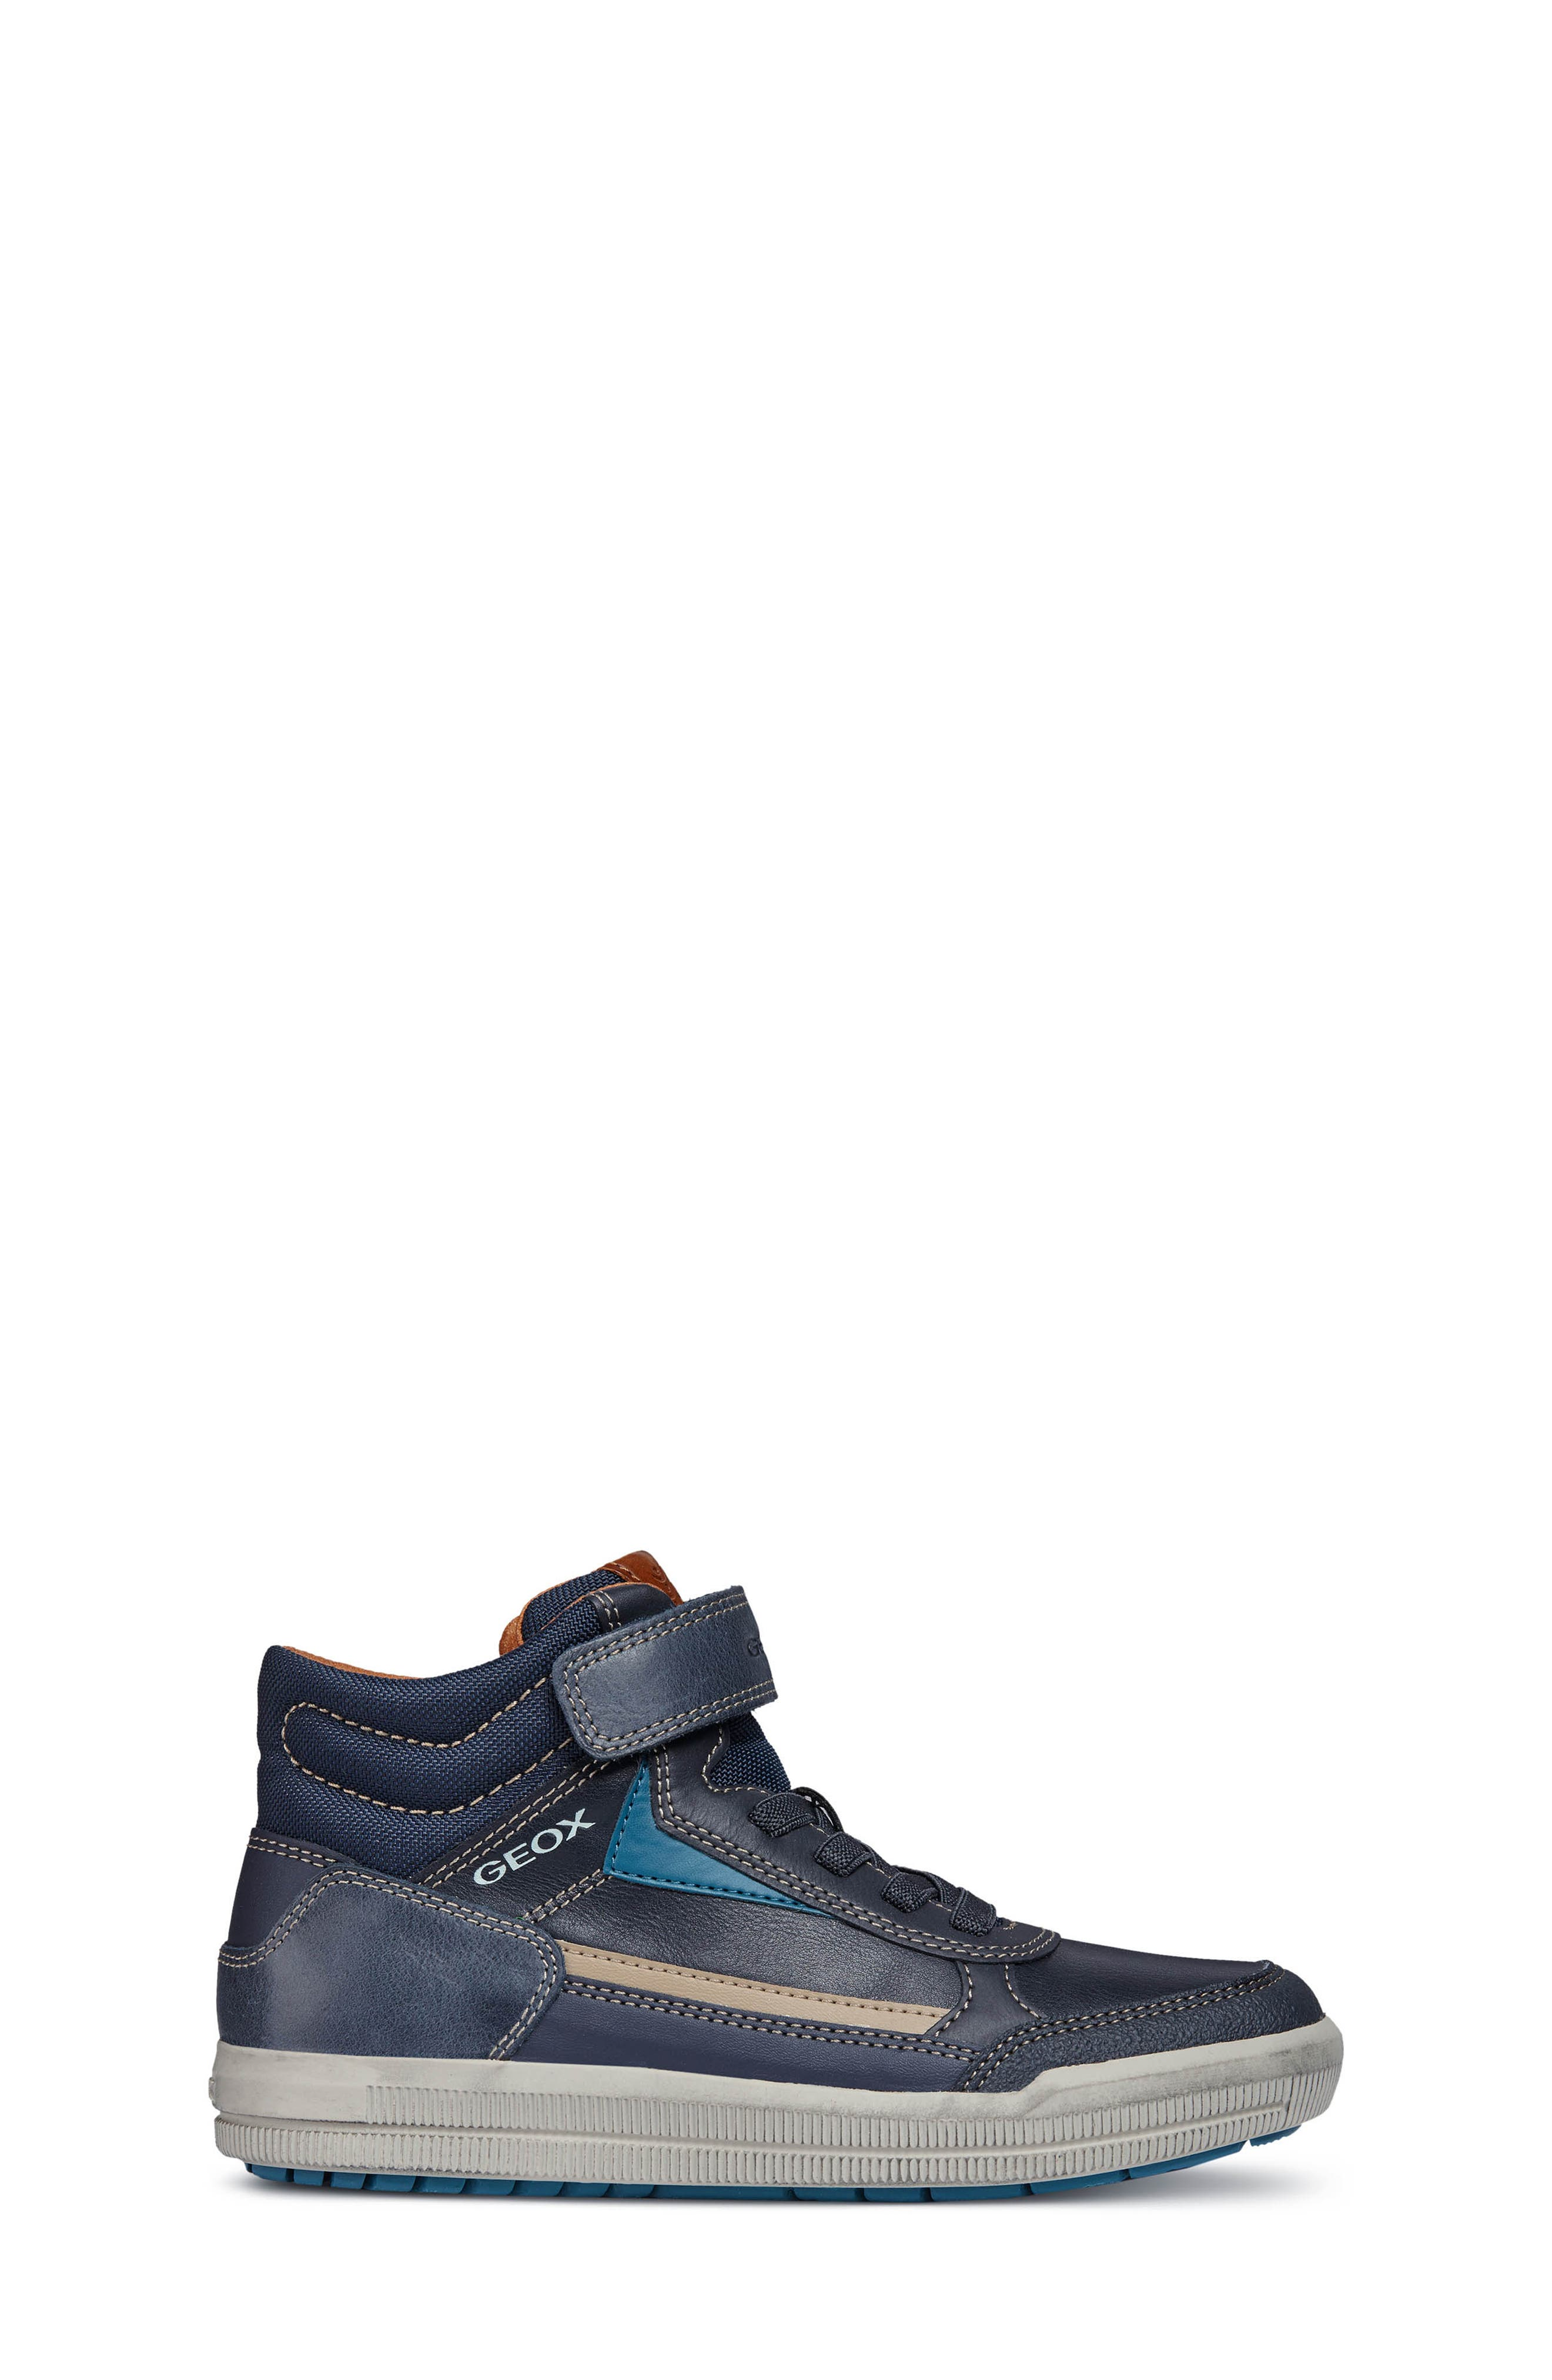 Arzach Mid Top Sneaker,                             Alternate thumbnail 4, color,                             Navy/Petrol